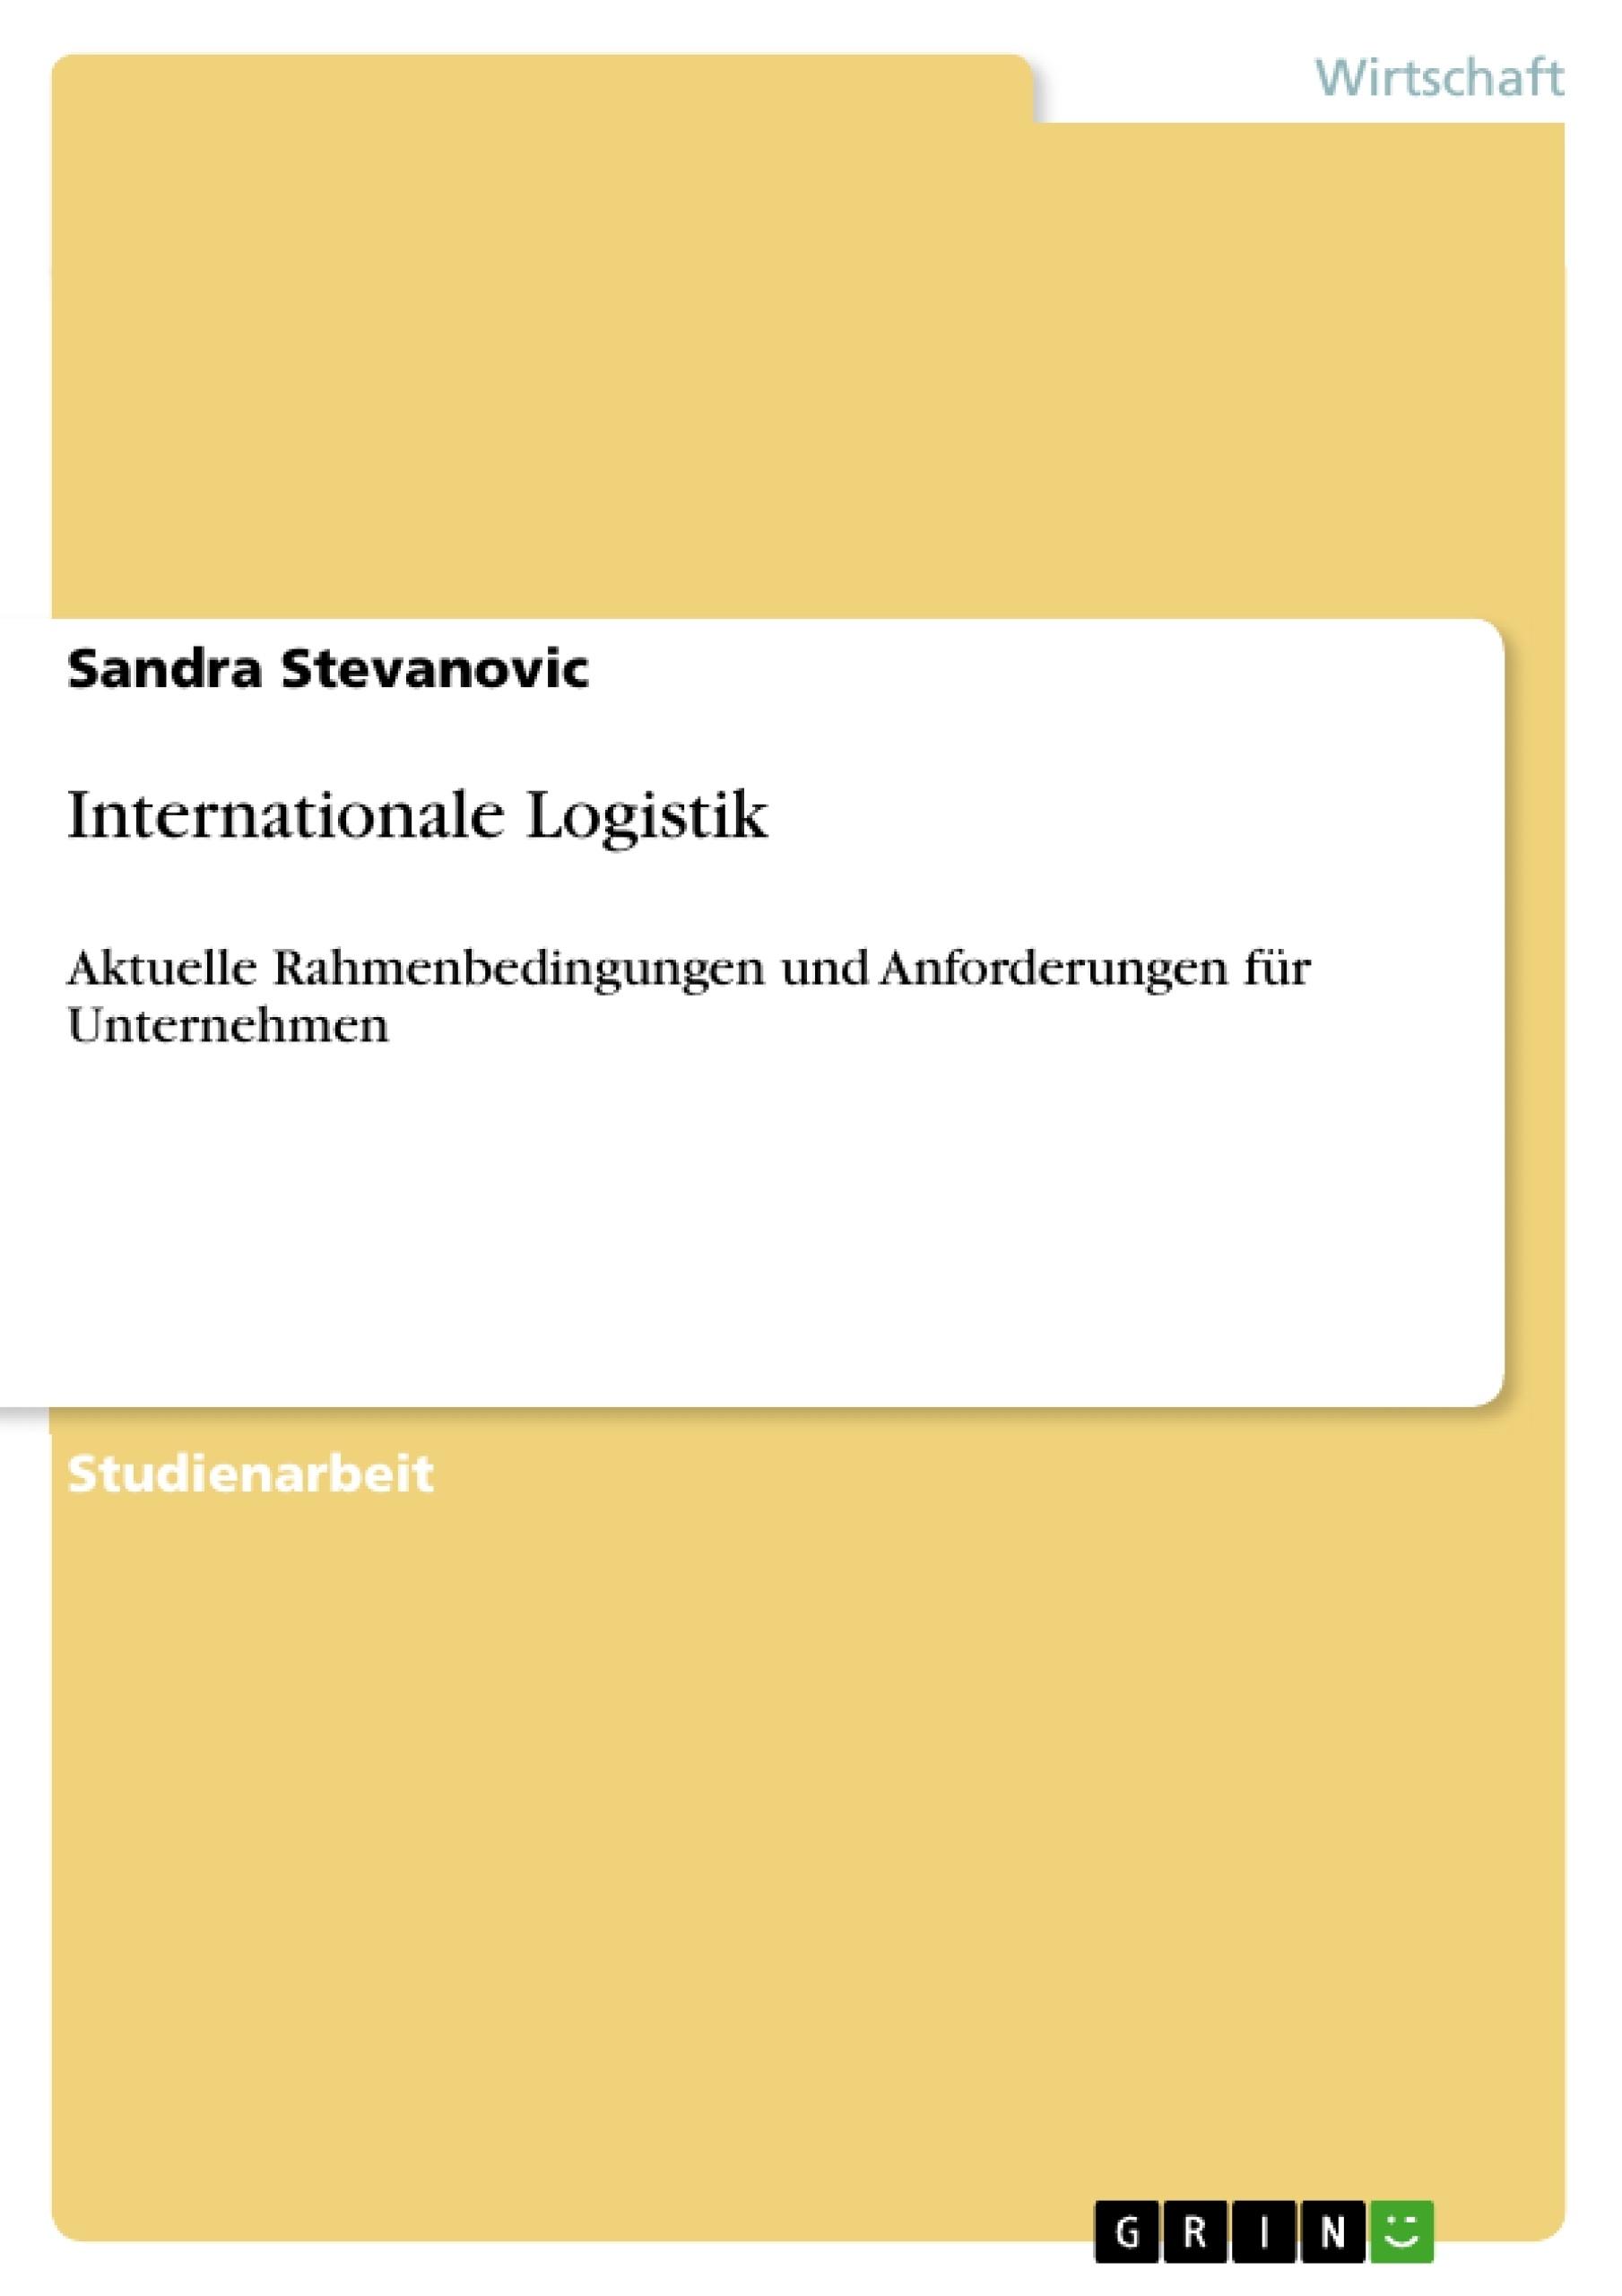 Titel: Internationale Logistik